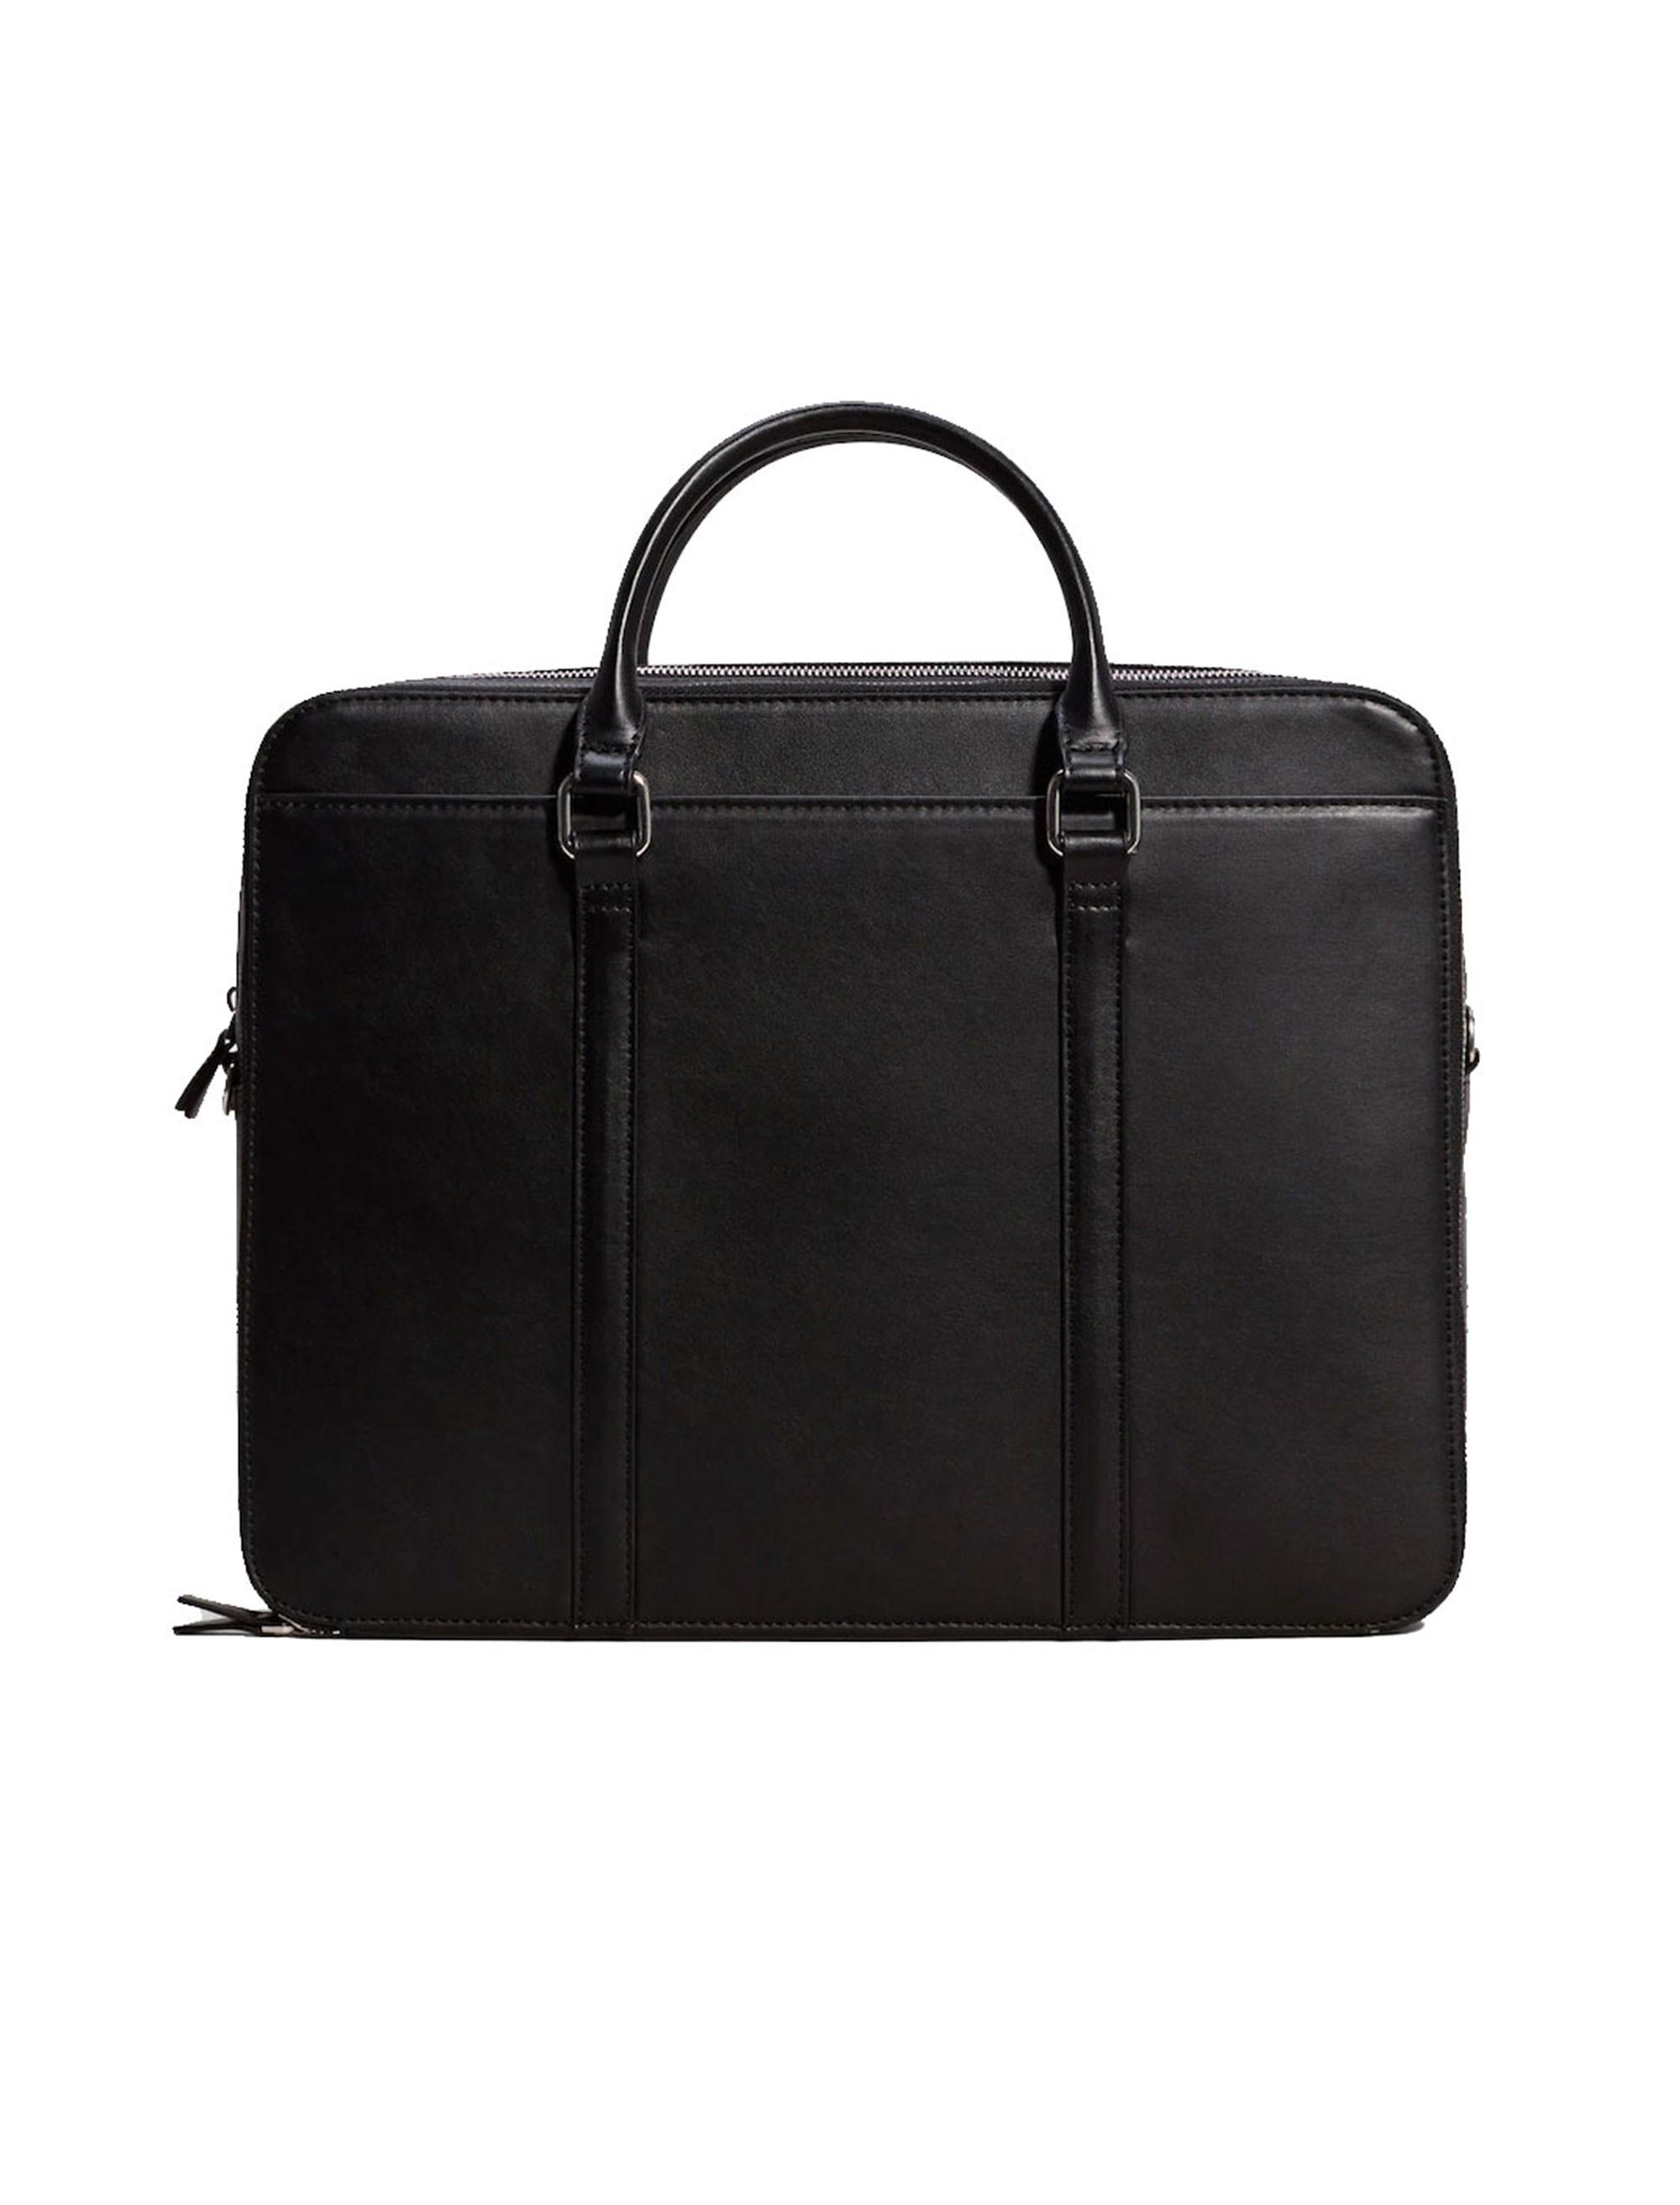 کیف روزمره دستی مردانه - مشکي - 1